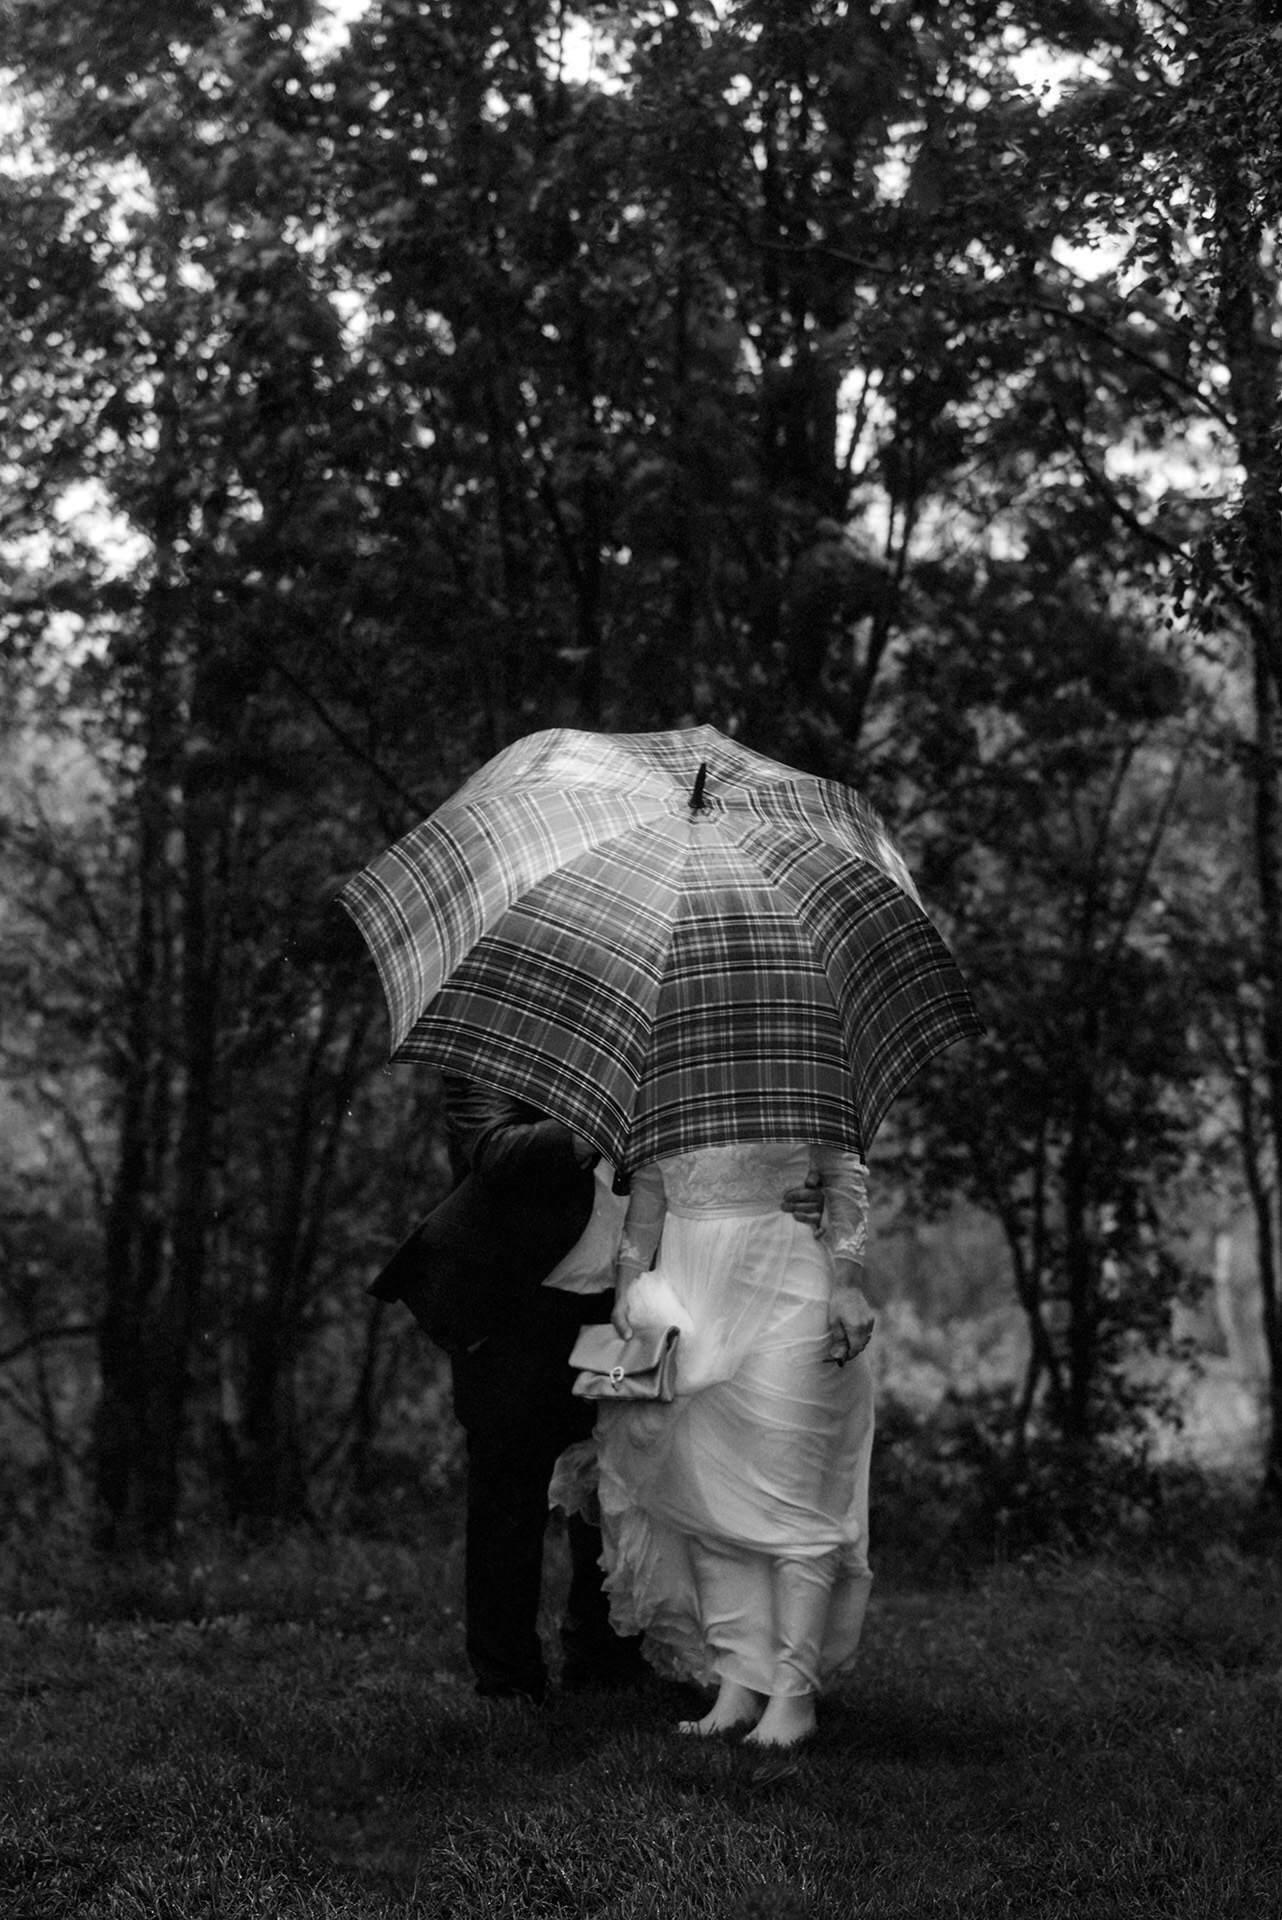 eloping to scotland during wet season couple standing under an umbrella wedding